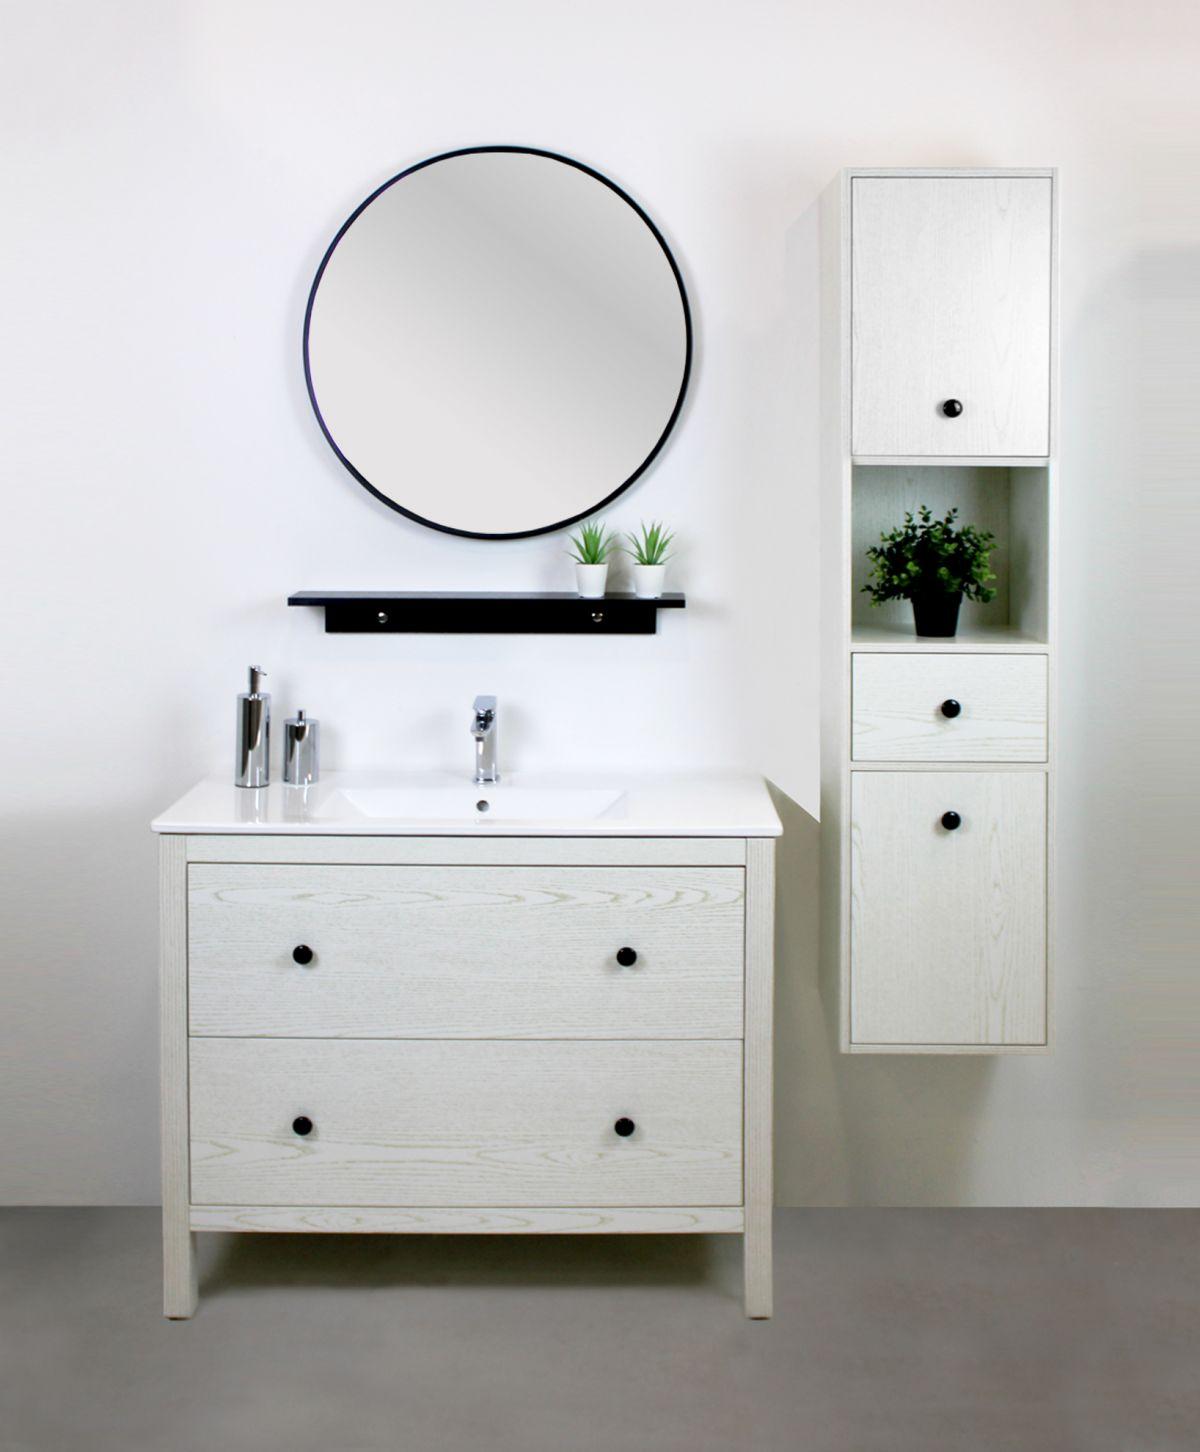 parigi 1 1 Mobile bagno Parigi terra 100 cm bianco decapè con lavabo specchio, pensile e colonna